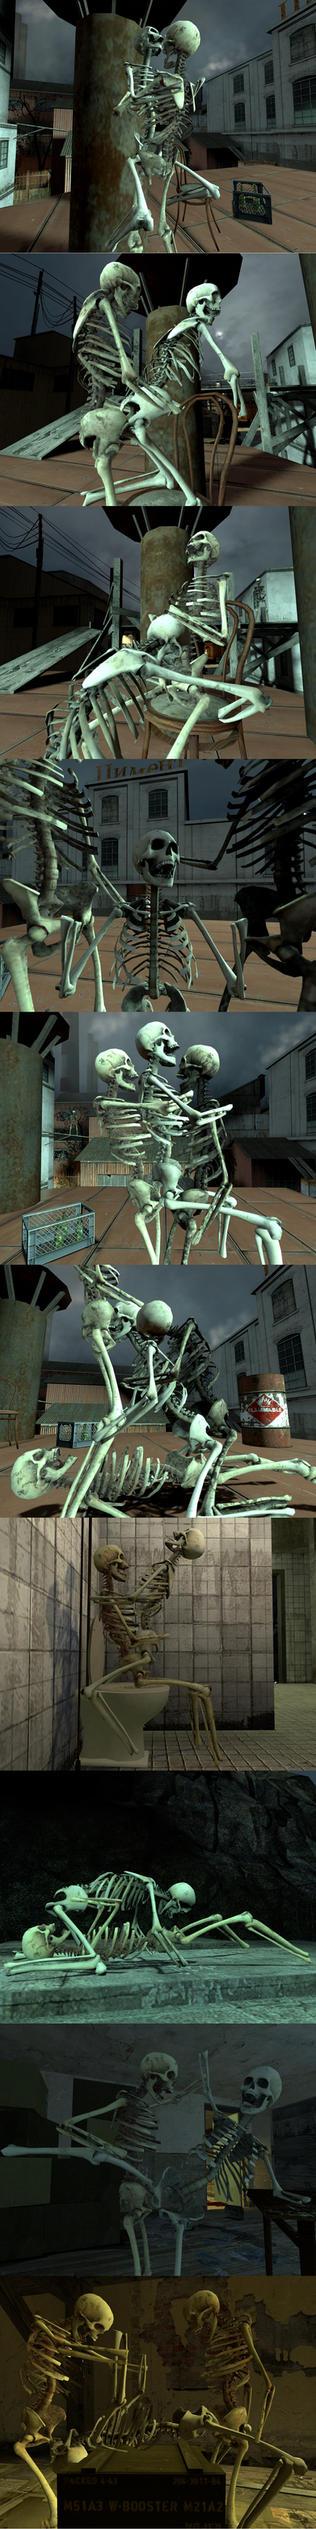 Skeleton Porn by DevilTraitor